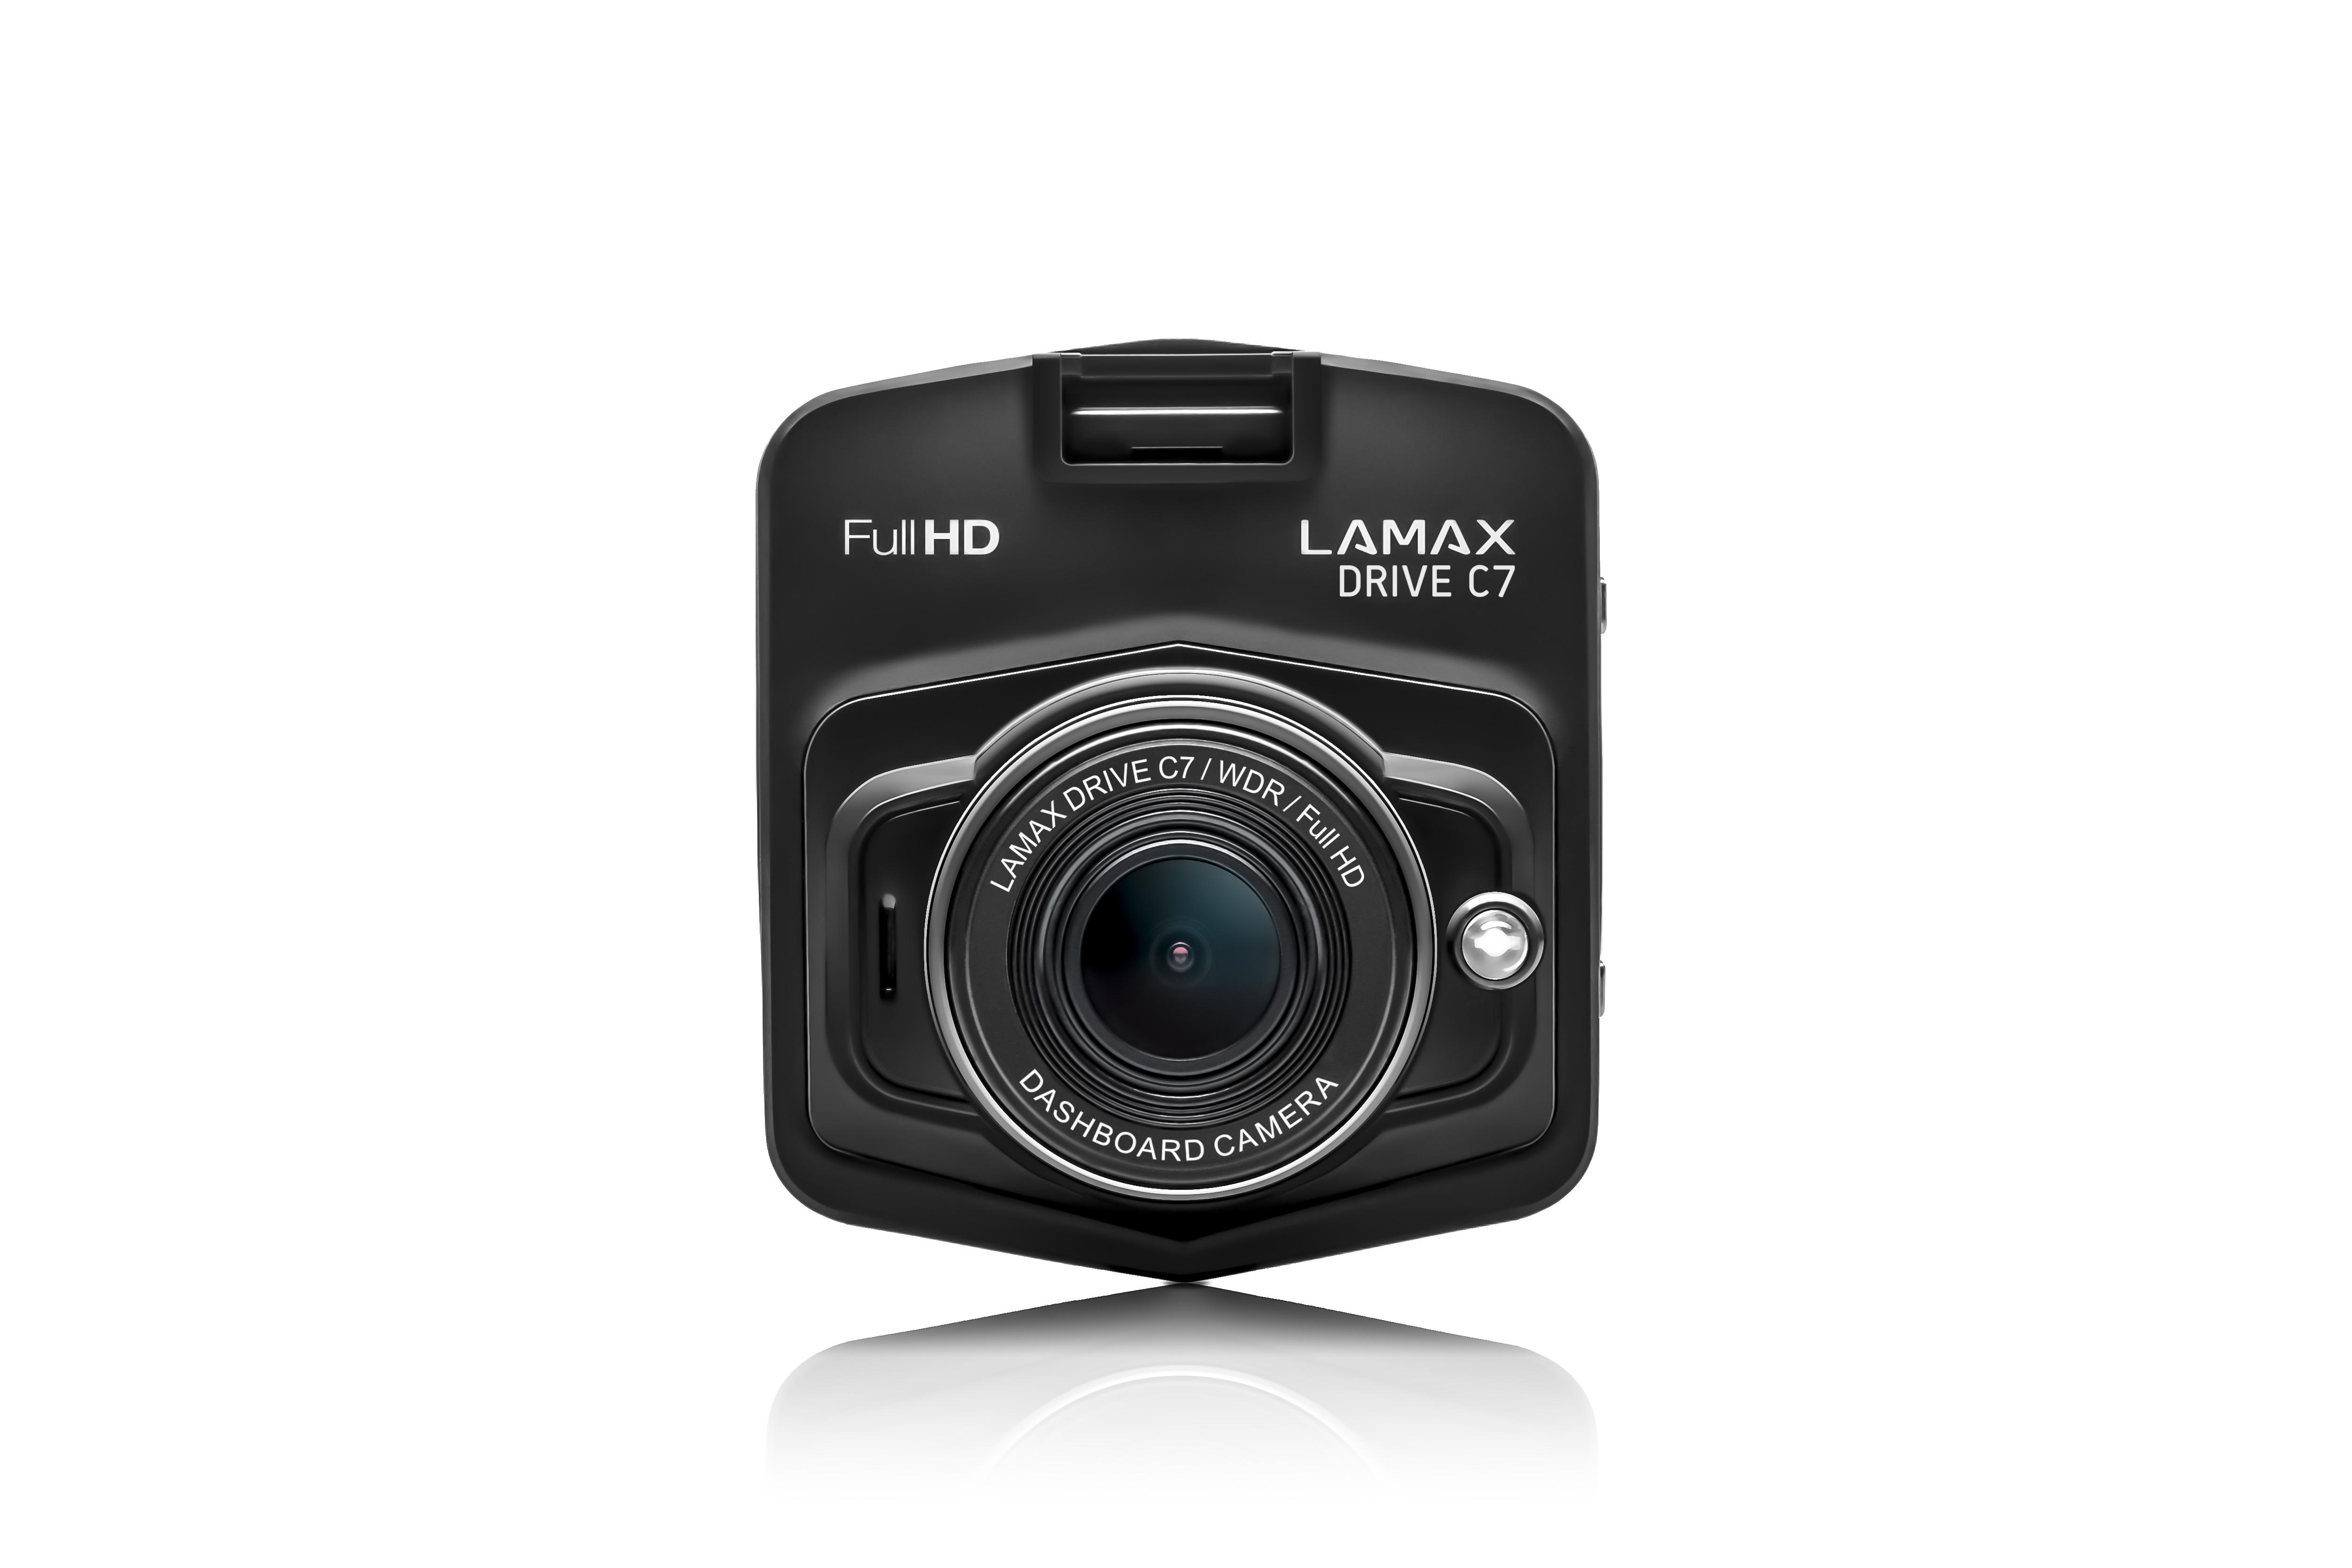 LAMAX-DRIVE-C7-fullHD